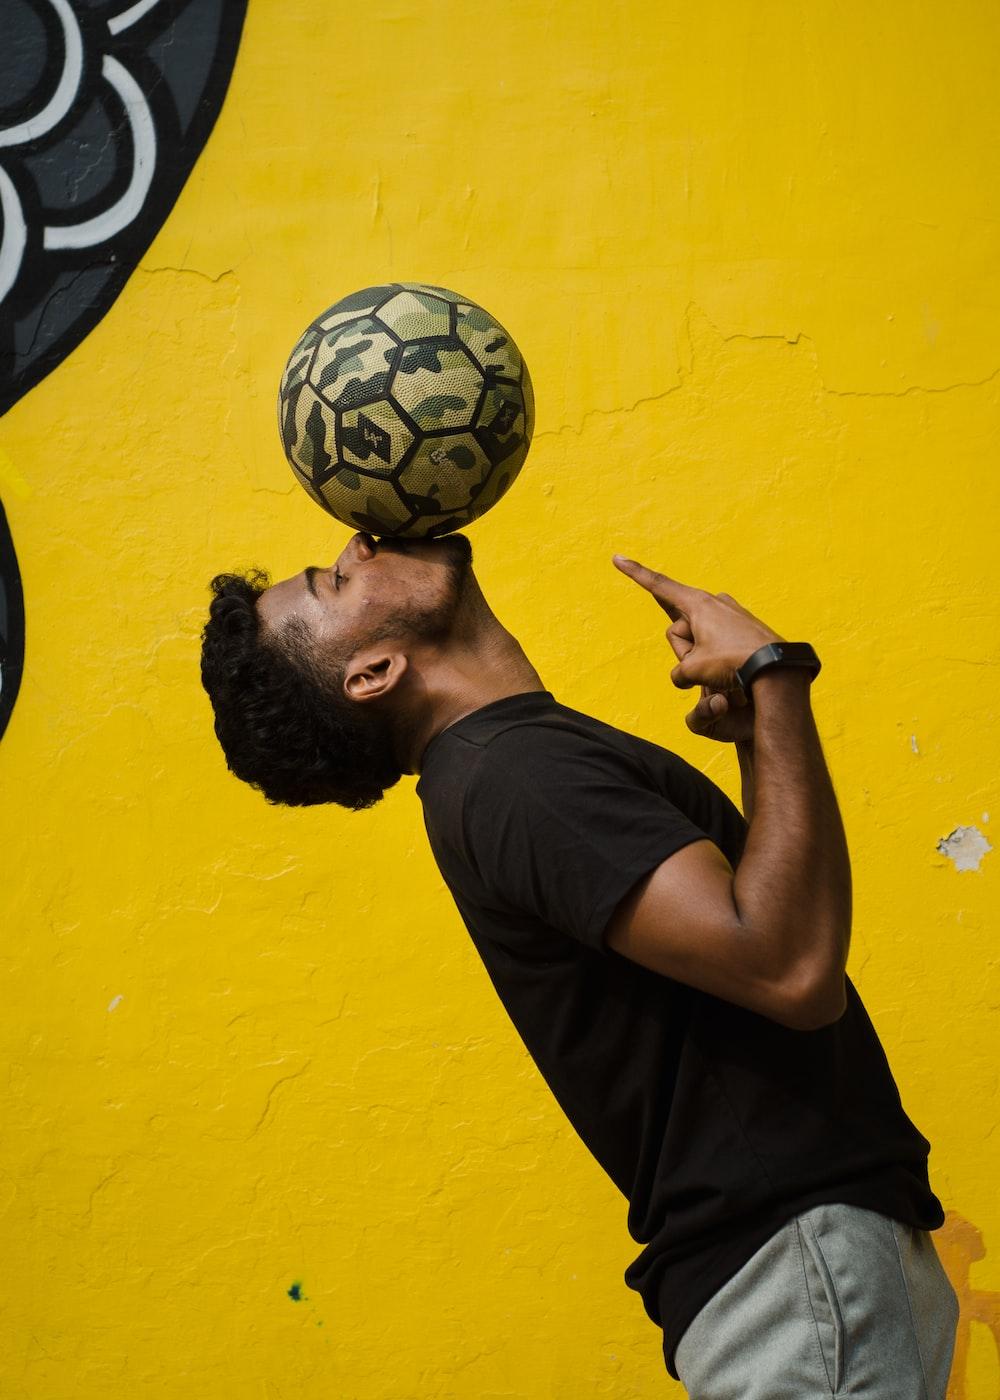 man in black crew neck t-shirt holding black and white soccer ball